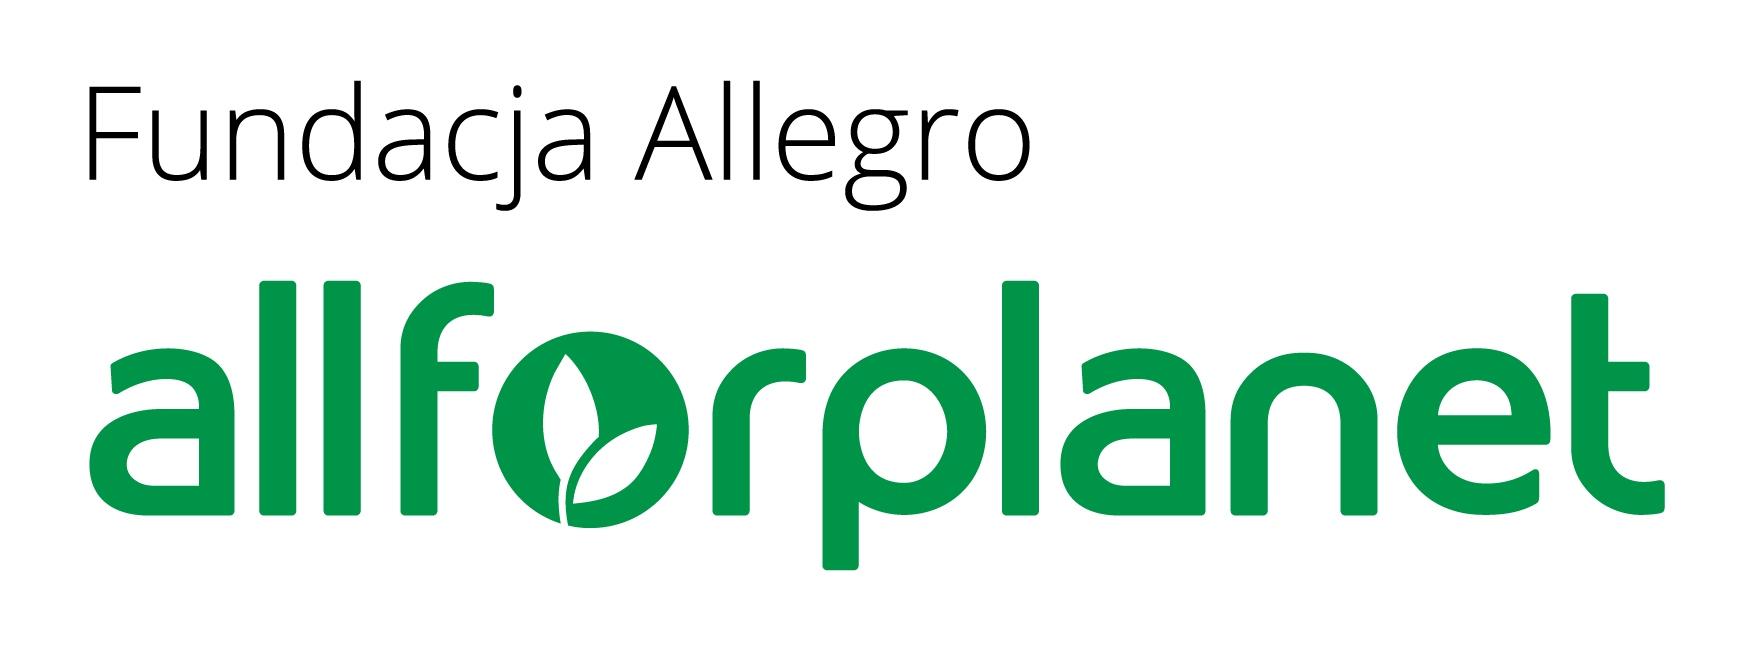 Fundacja Allegro All For Planet Allegro Charytatywni